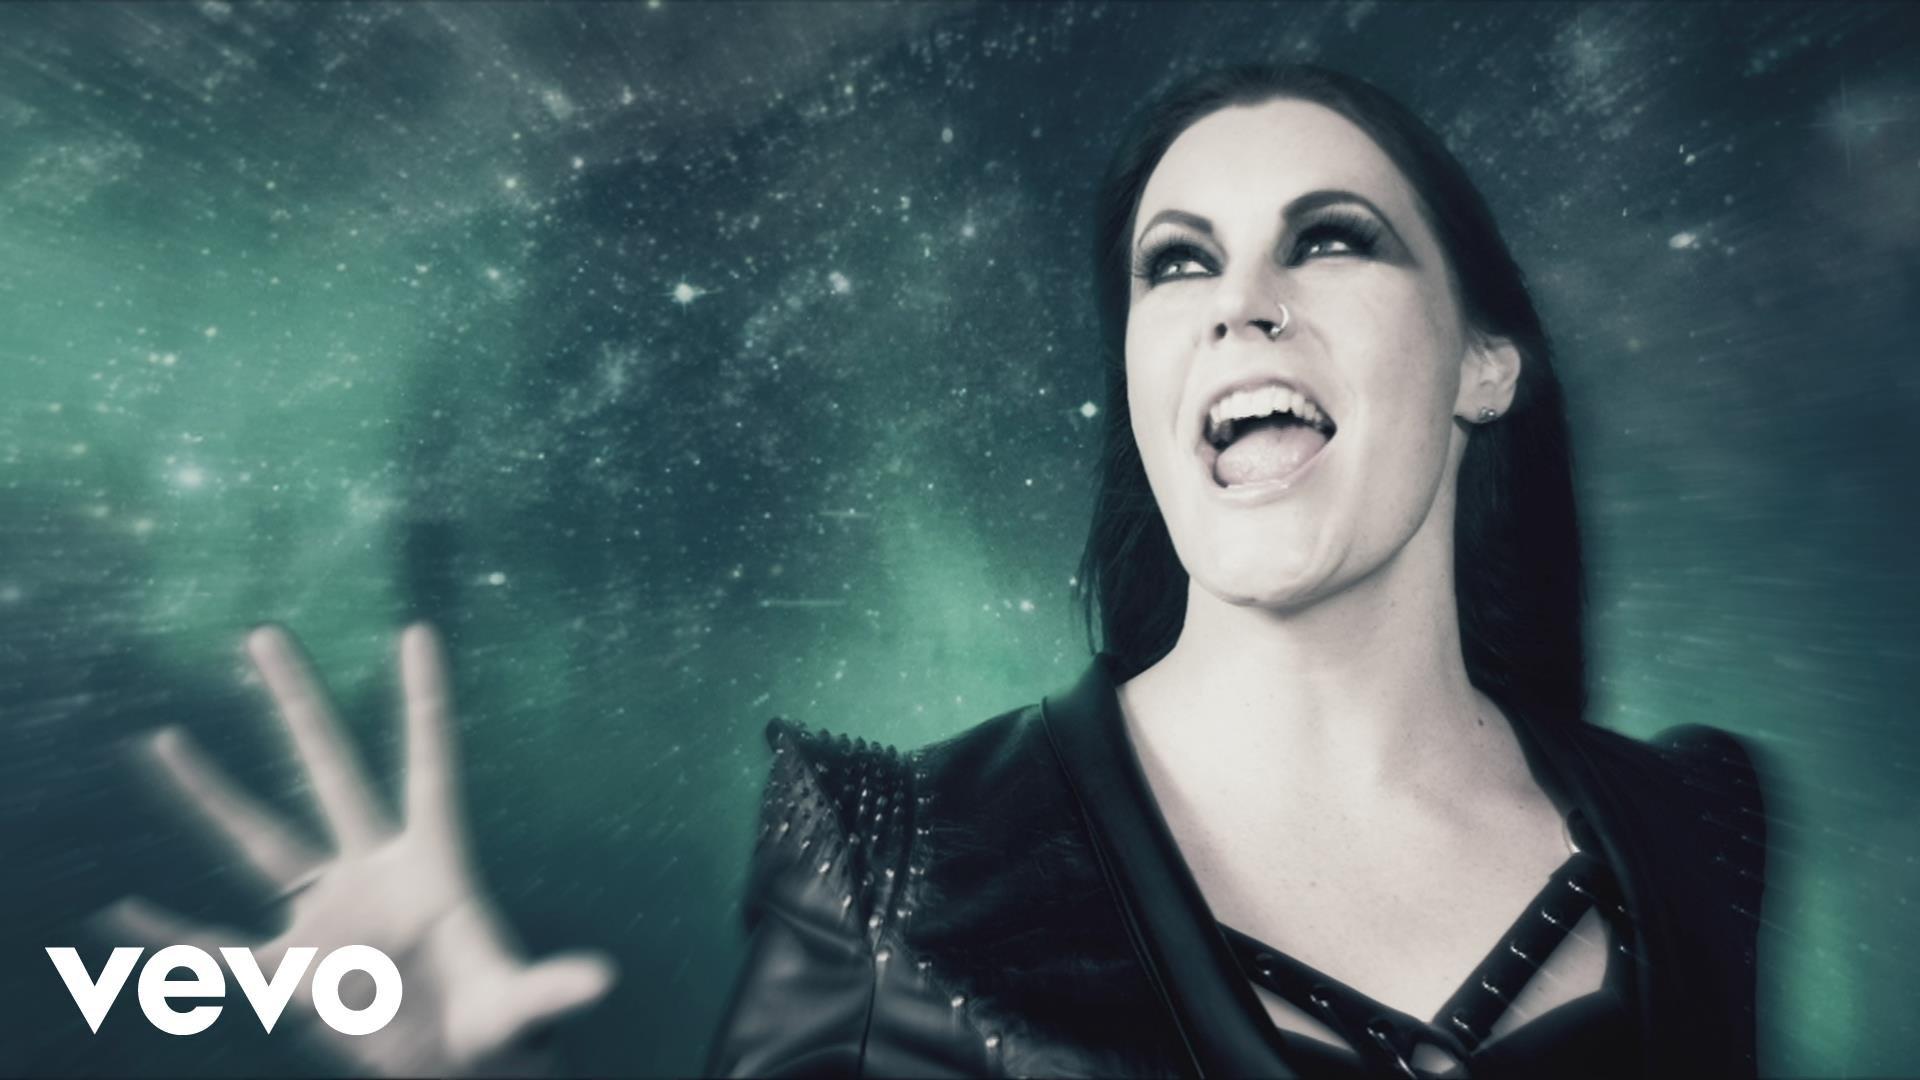 Nightwish maps out 2018 Decades World Tour - AXS